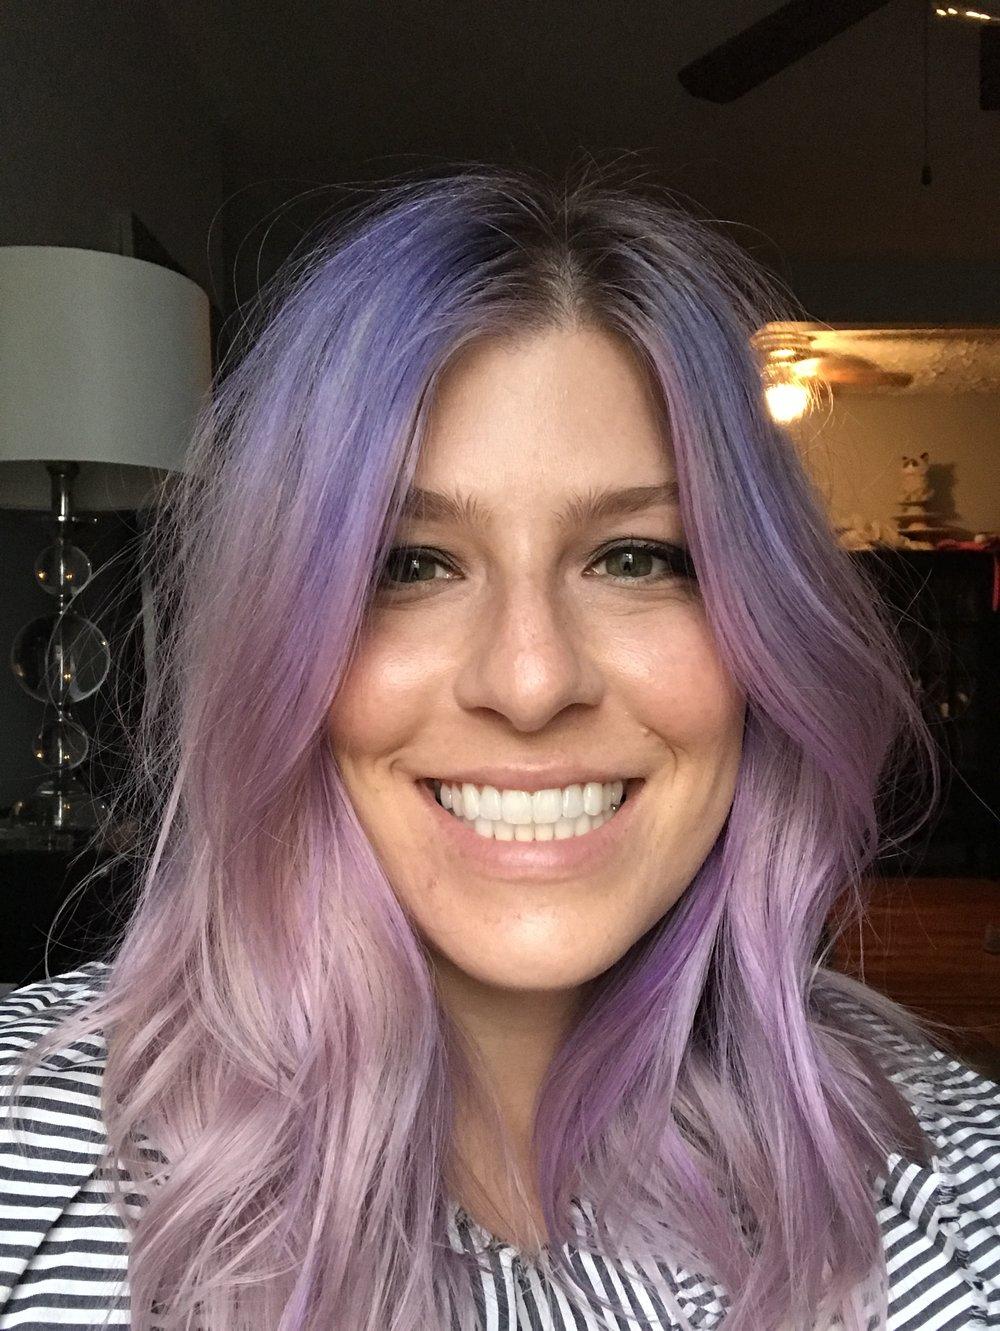 deenie hartzog mislock purple hair